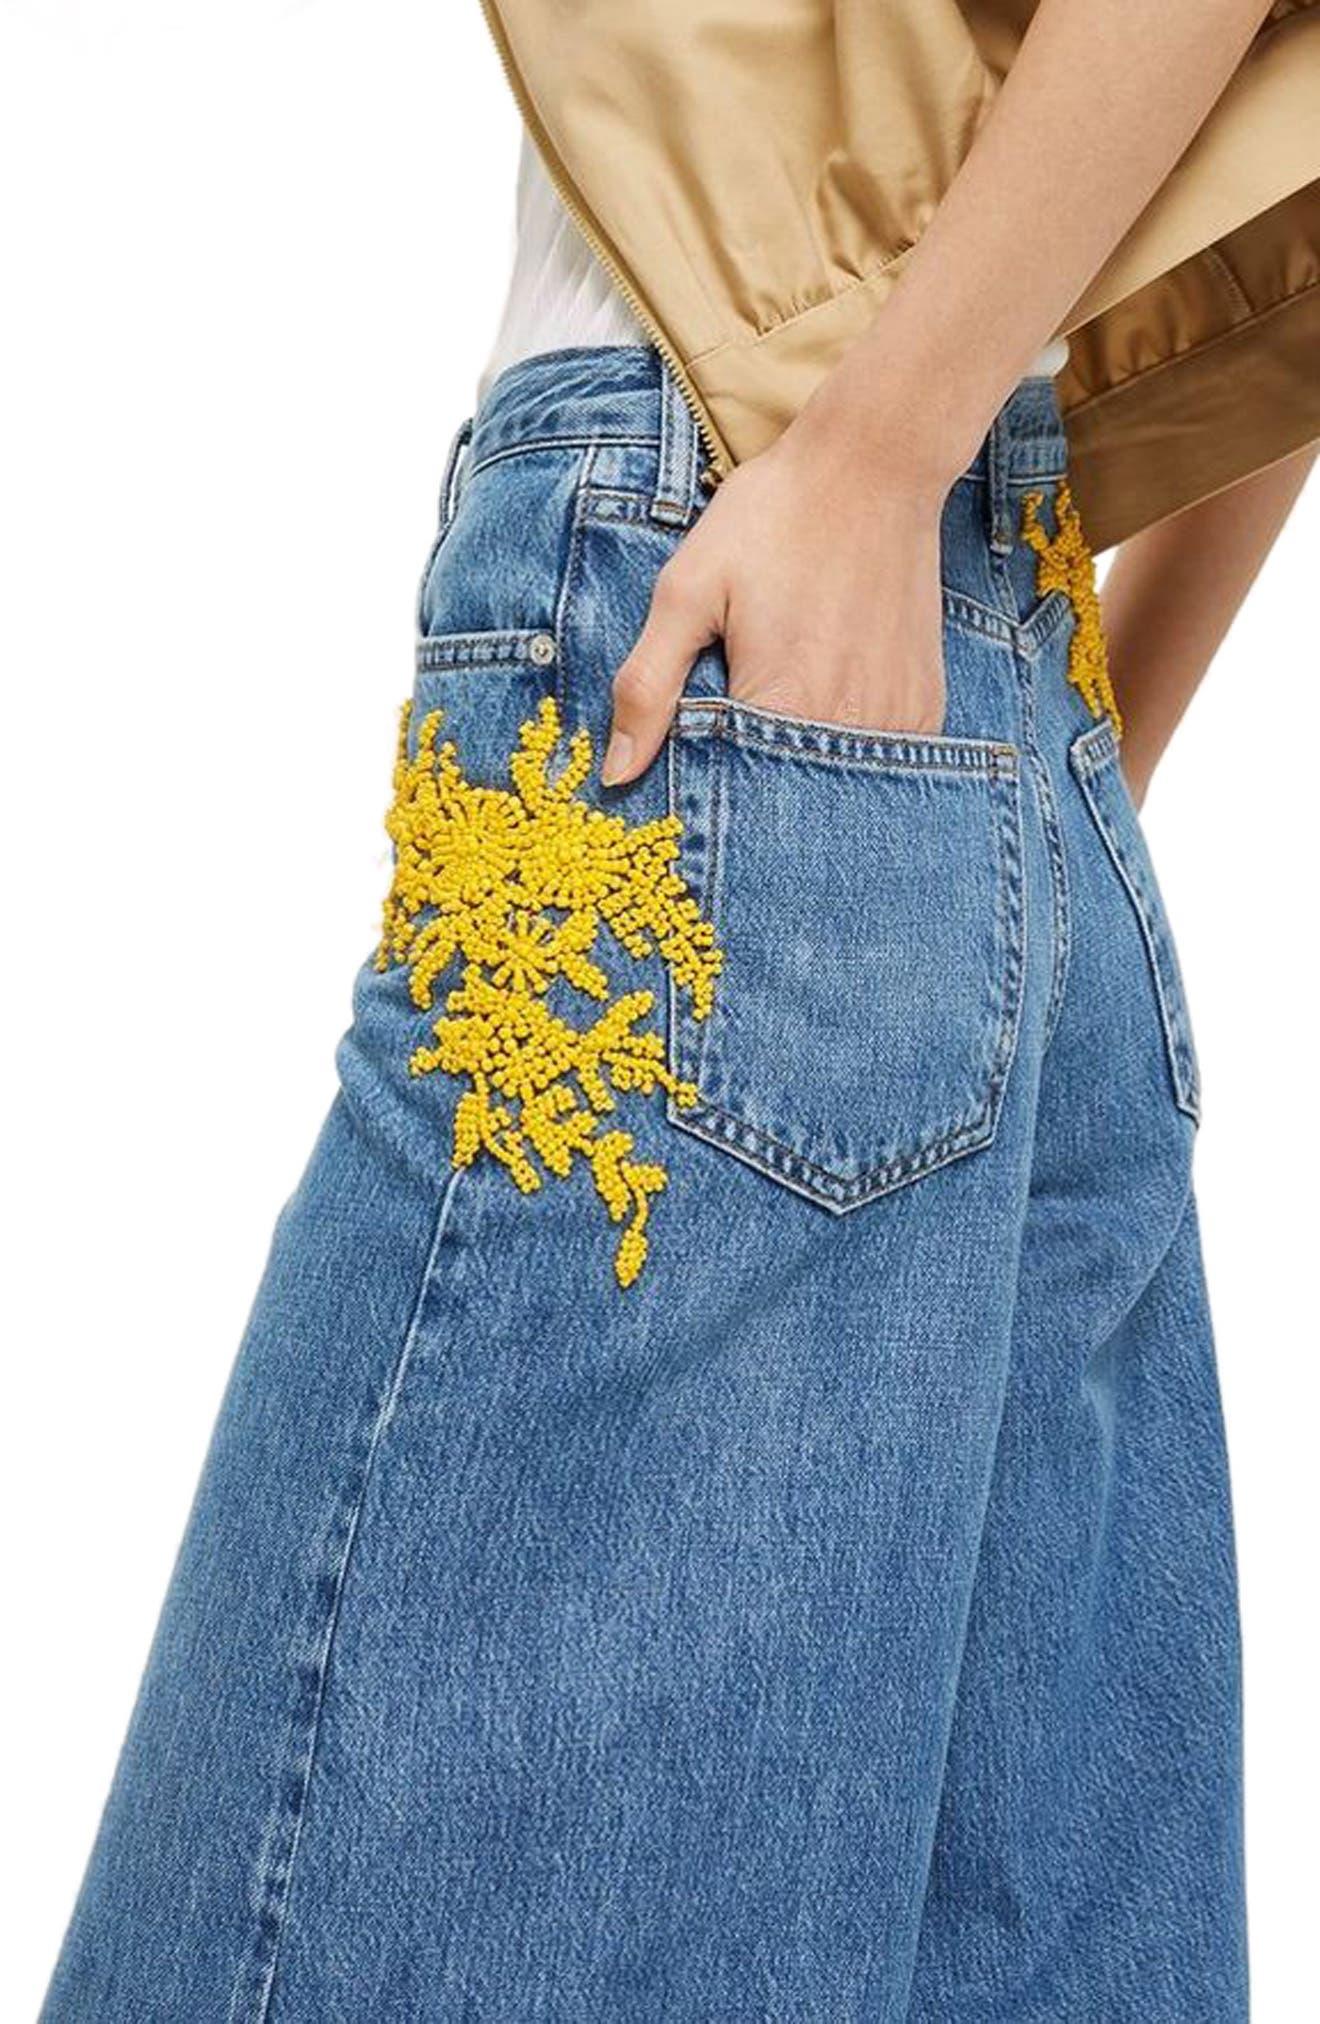 MOTO Bead Detail Wide Leg Non-Stretch Jeans,                             Alternate thumbnail 3, color,                             Mid Denim